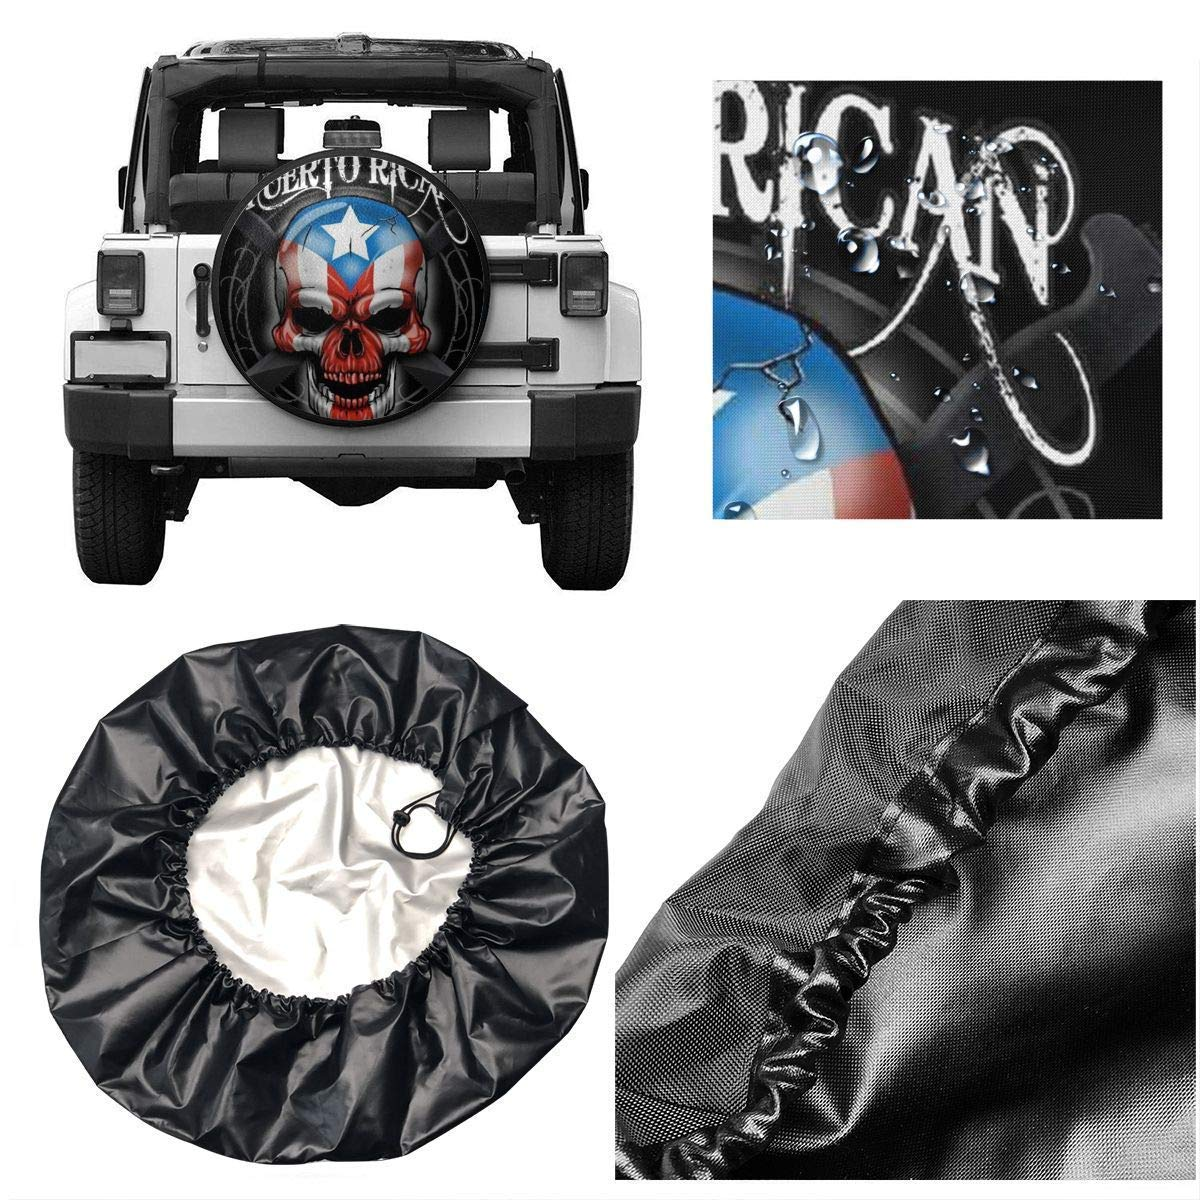 Puerto Rico Skull Potable Polyester Universal Spare Wheel Tire Cover Wheel Covers Jeep Trailer RV SUV Truck Camper Travel Trailer Accessories 15 in Vbnbvn Reserveradabdeckung